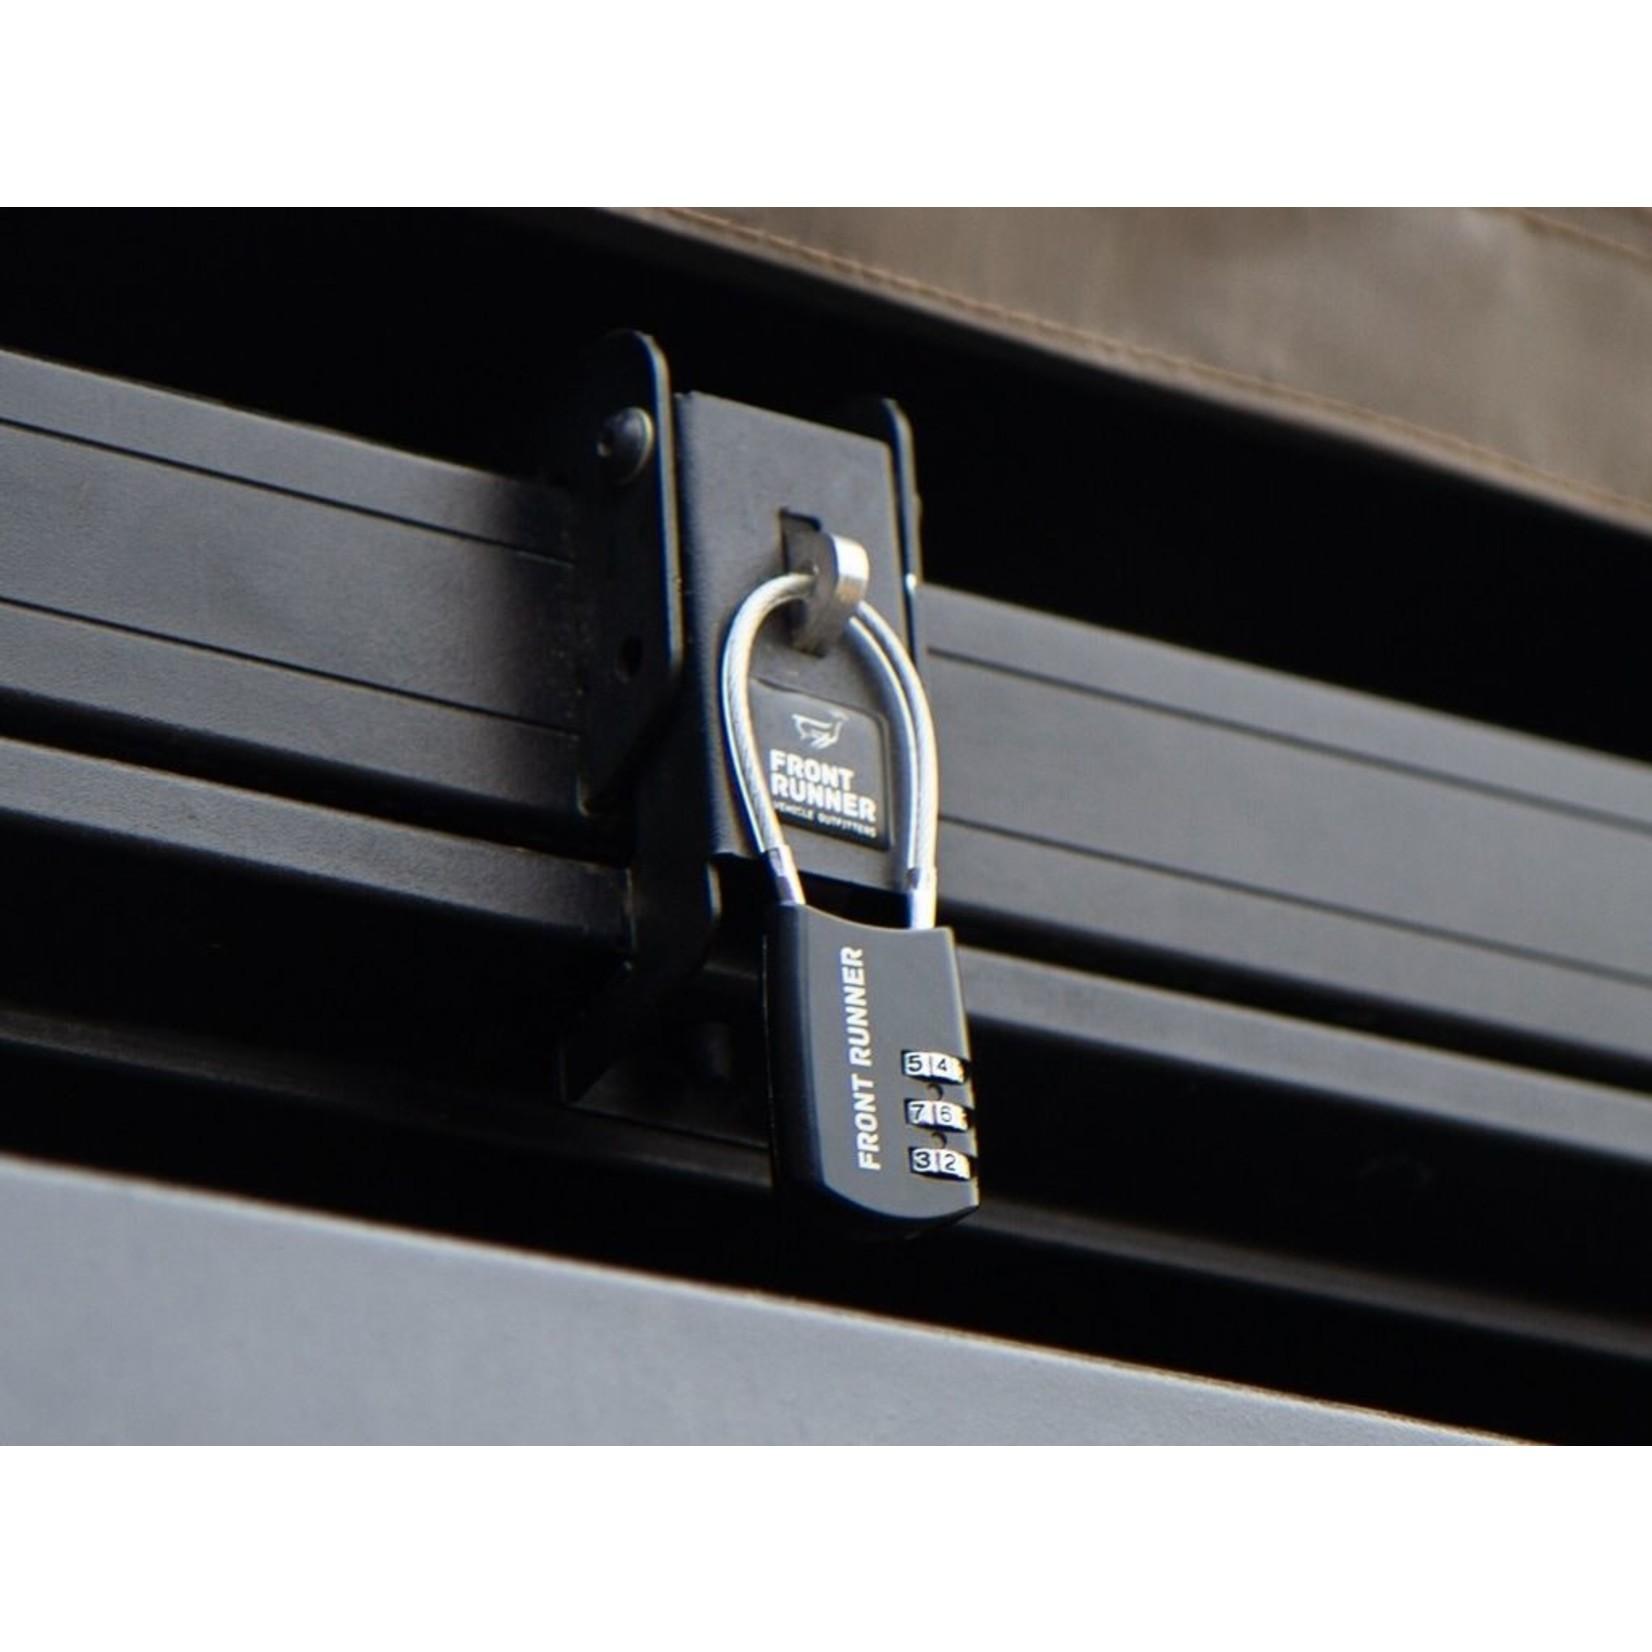 Front Runner Front Runner Rack Accessory Lock Small